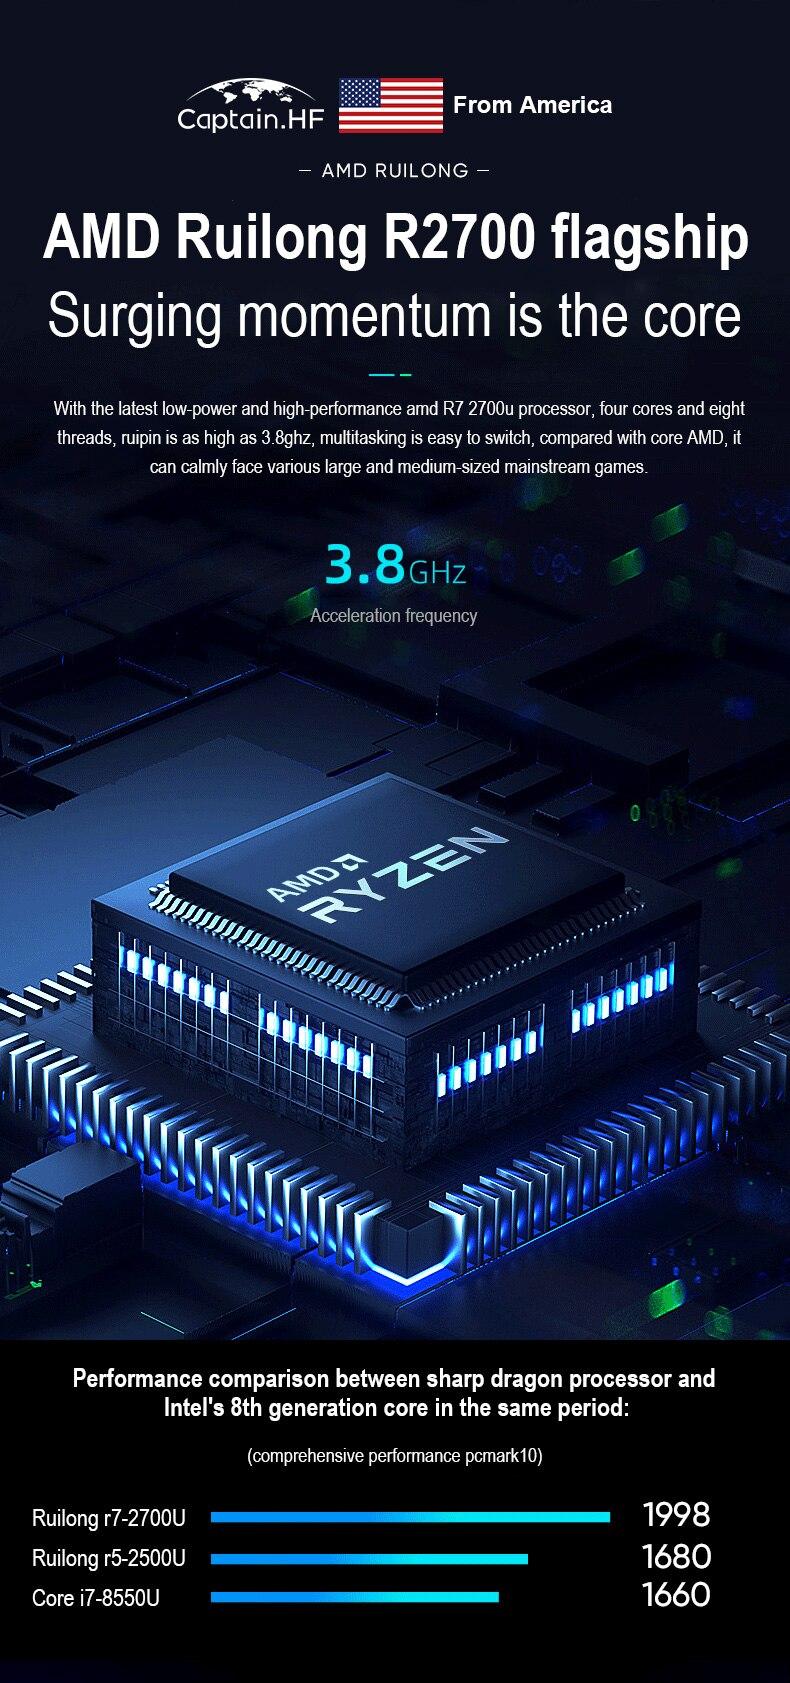 US Captain AMD Ryzen R7 2700U Ultra thin Fingerprint Unlock for Gaming, Study, Work 15.6 inch 20G Memory Laptop enlarge